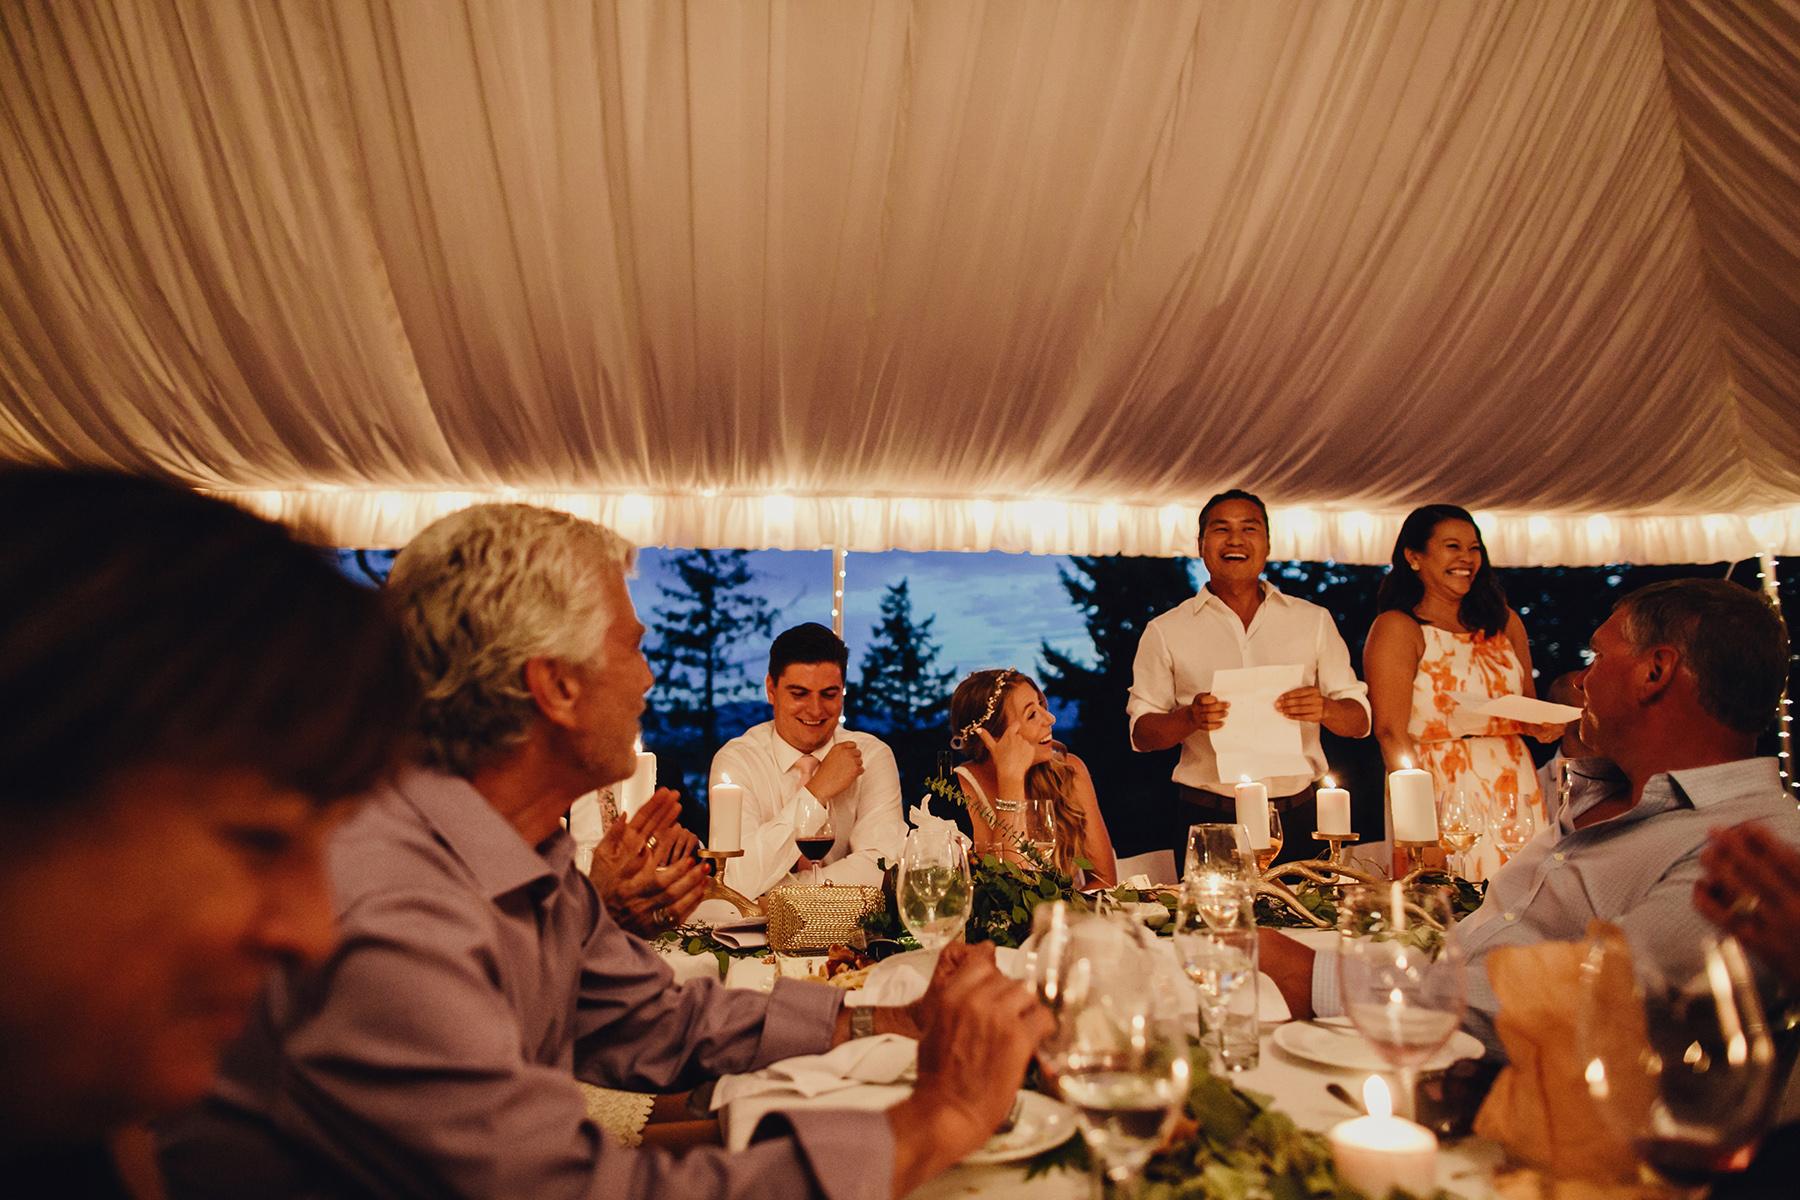 galiano-island-bodega-destination-wedding-0103.JPG